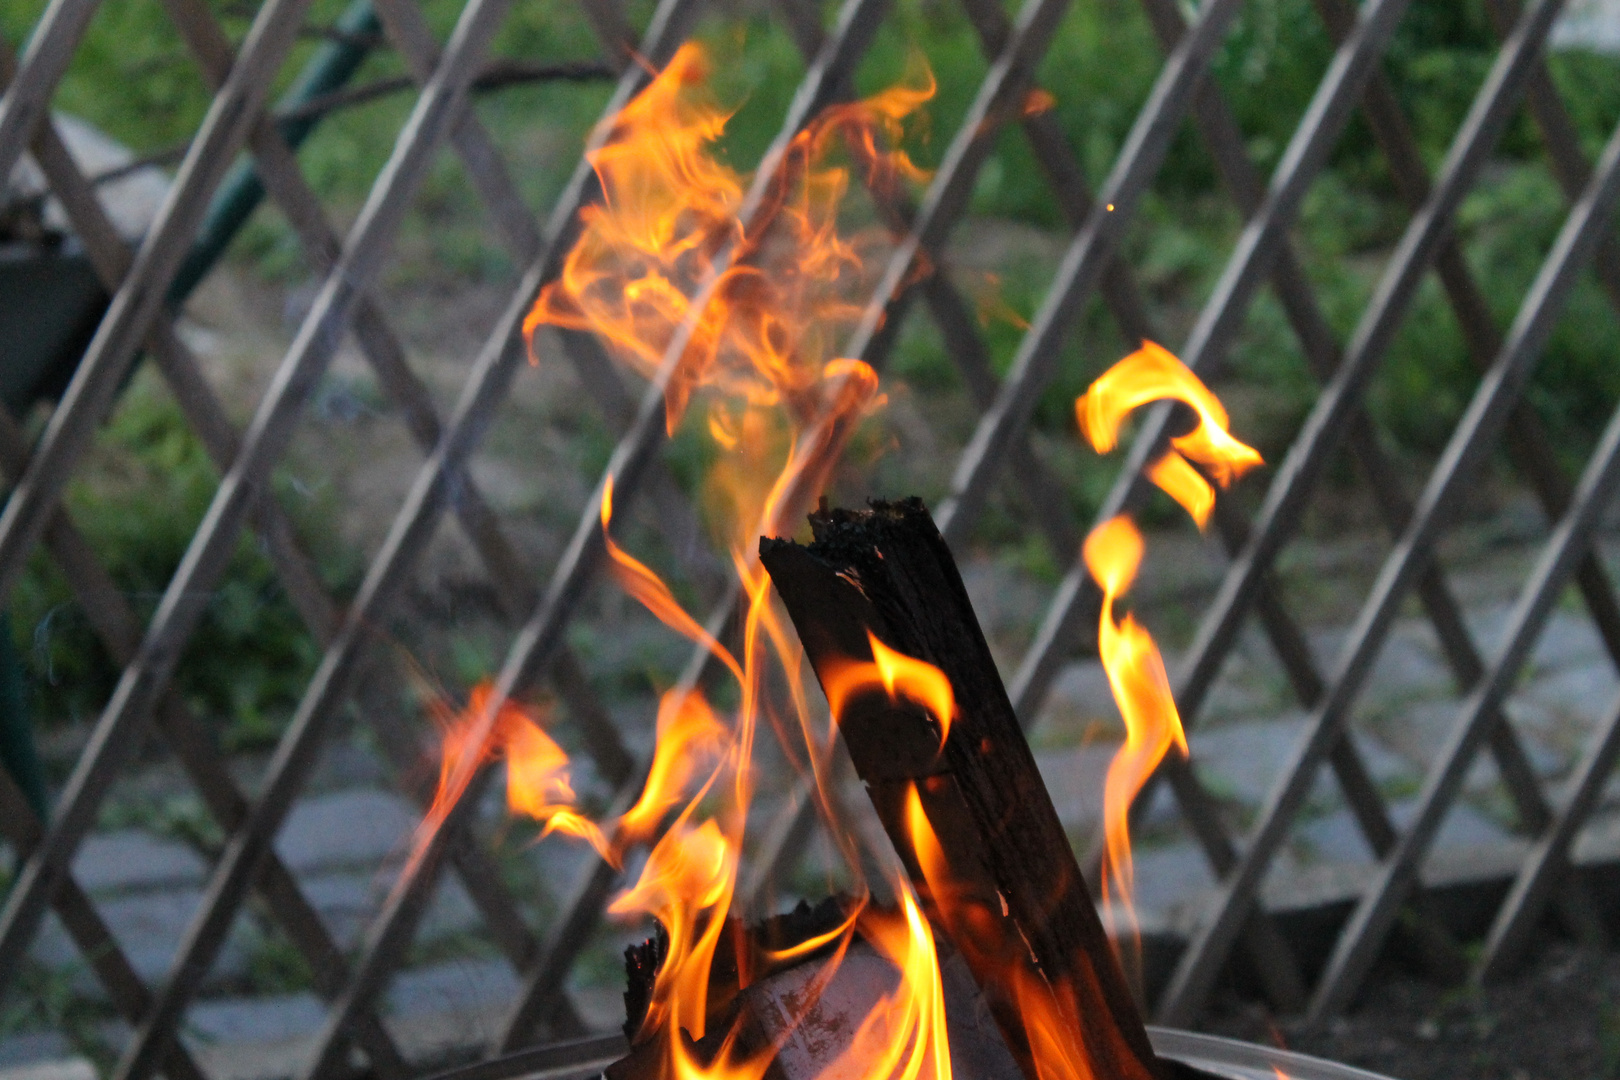 Feuer im Feuerkorb